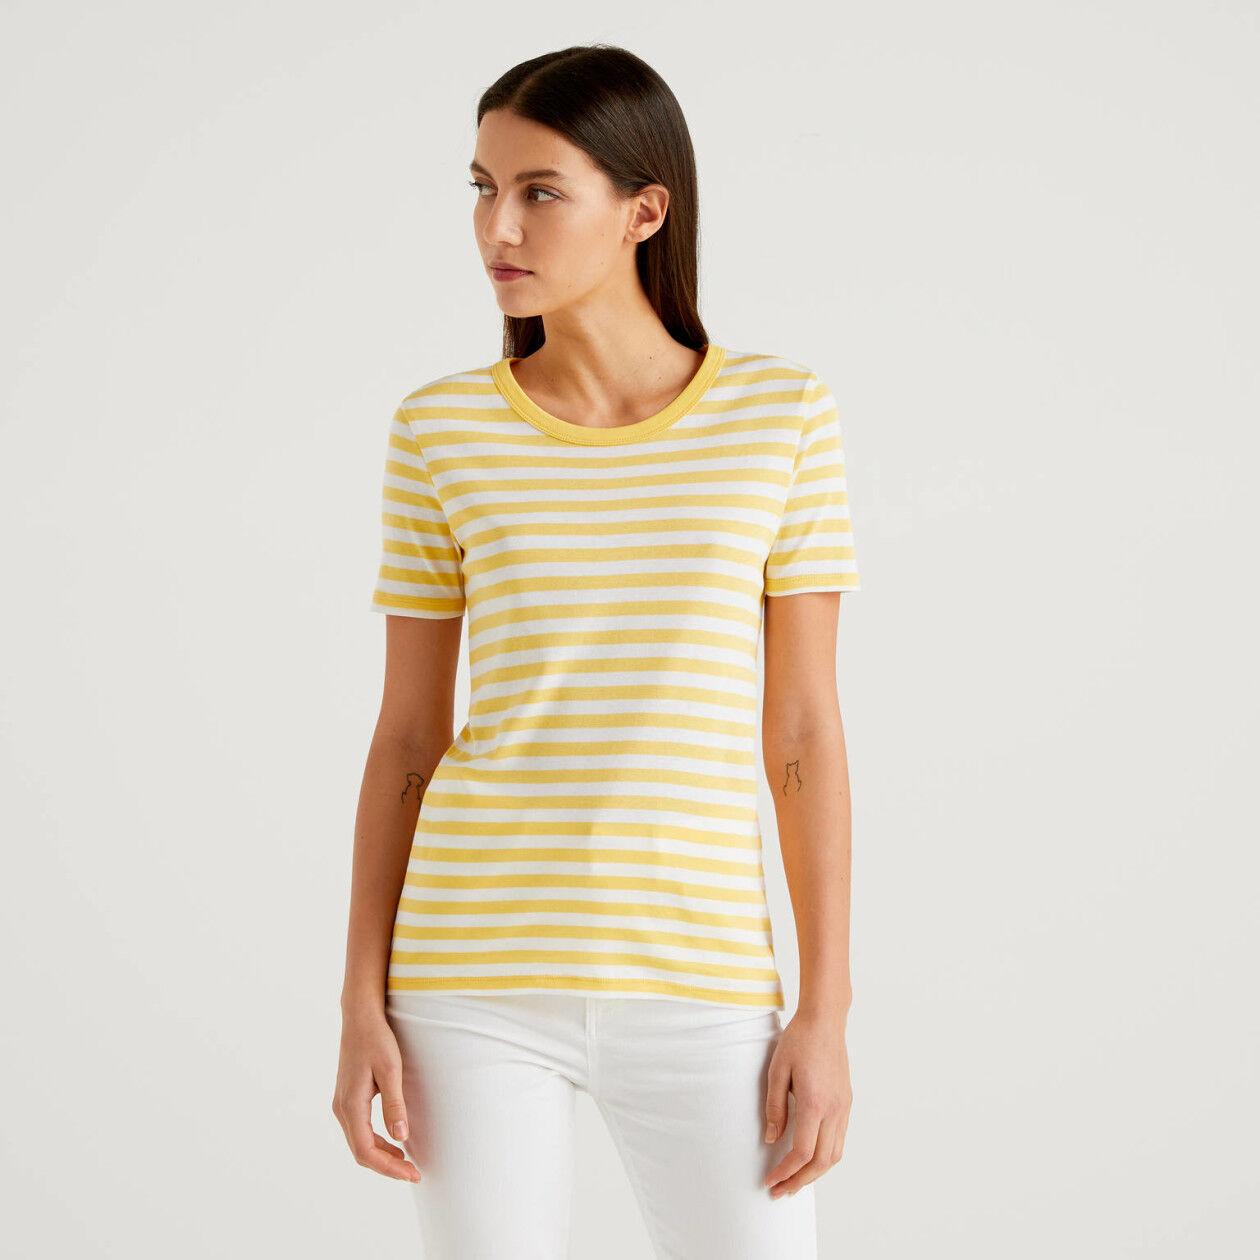 Striped short sleeve t-shirt